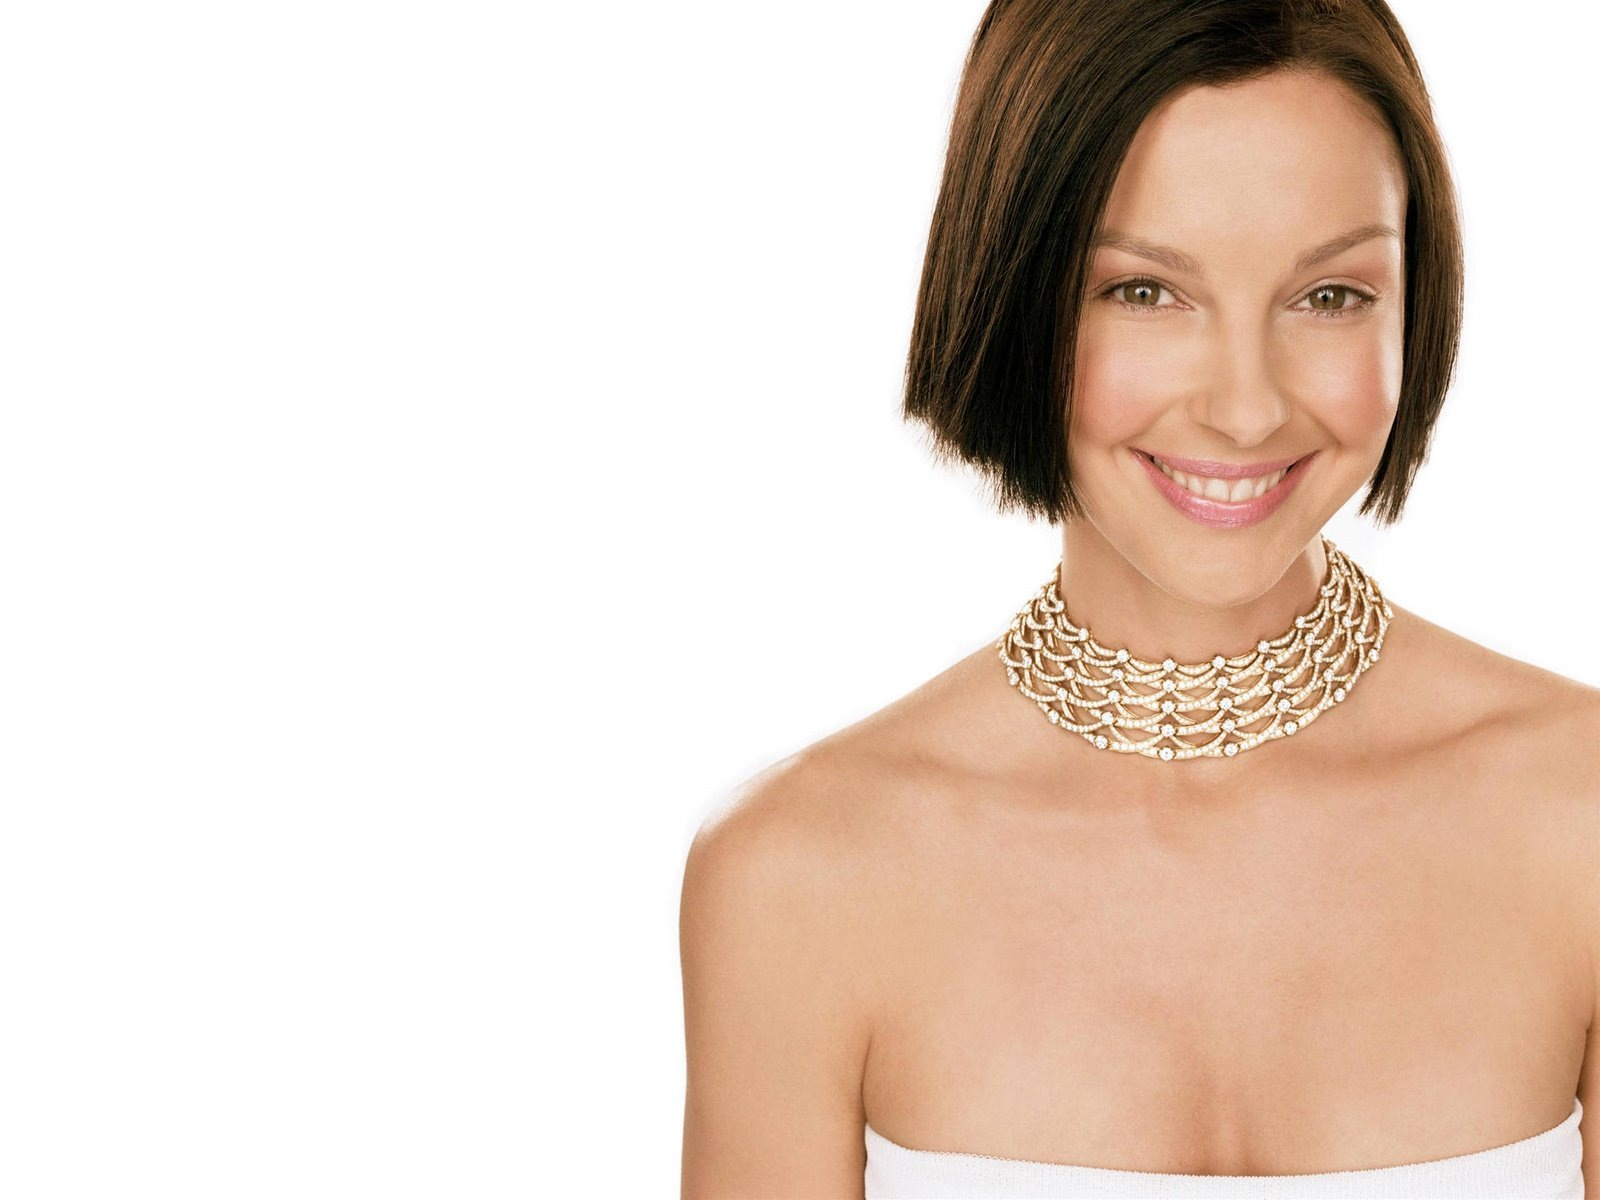 [Ashley Judd 20 1600x1200 hqmodelwallpapers[2].jpg]